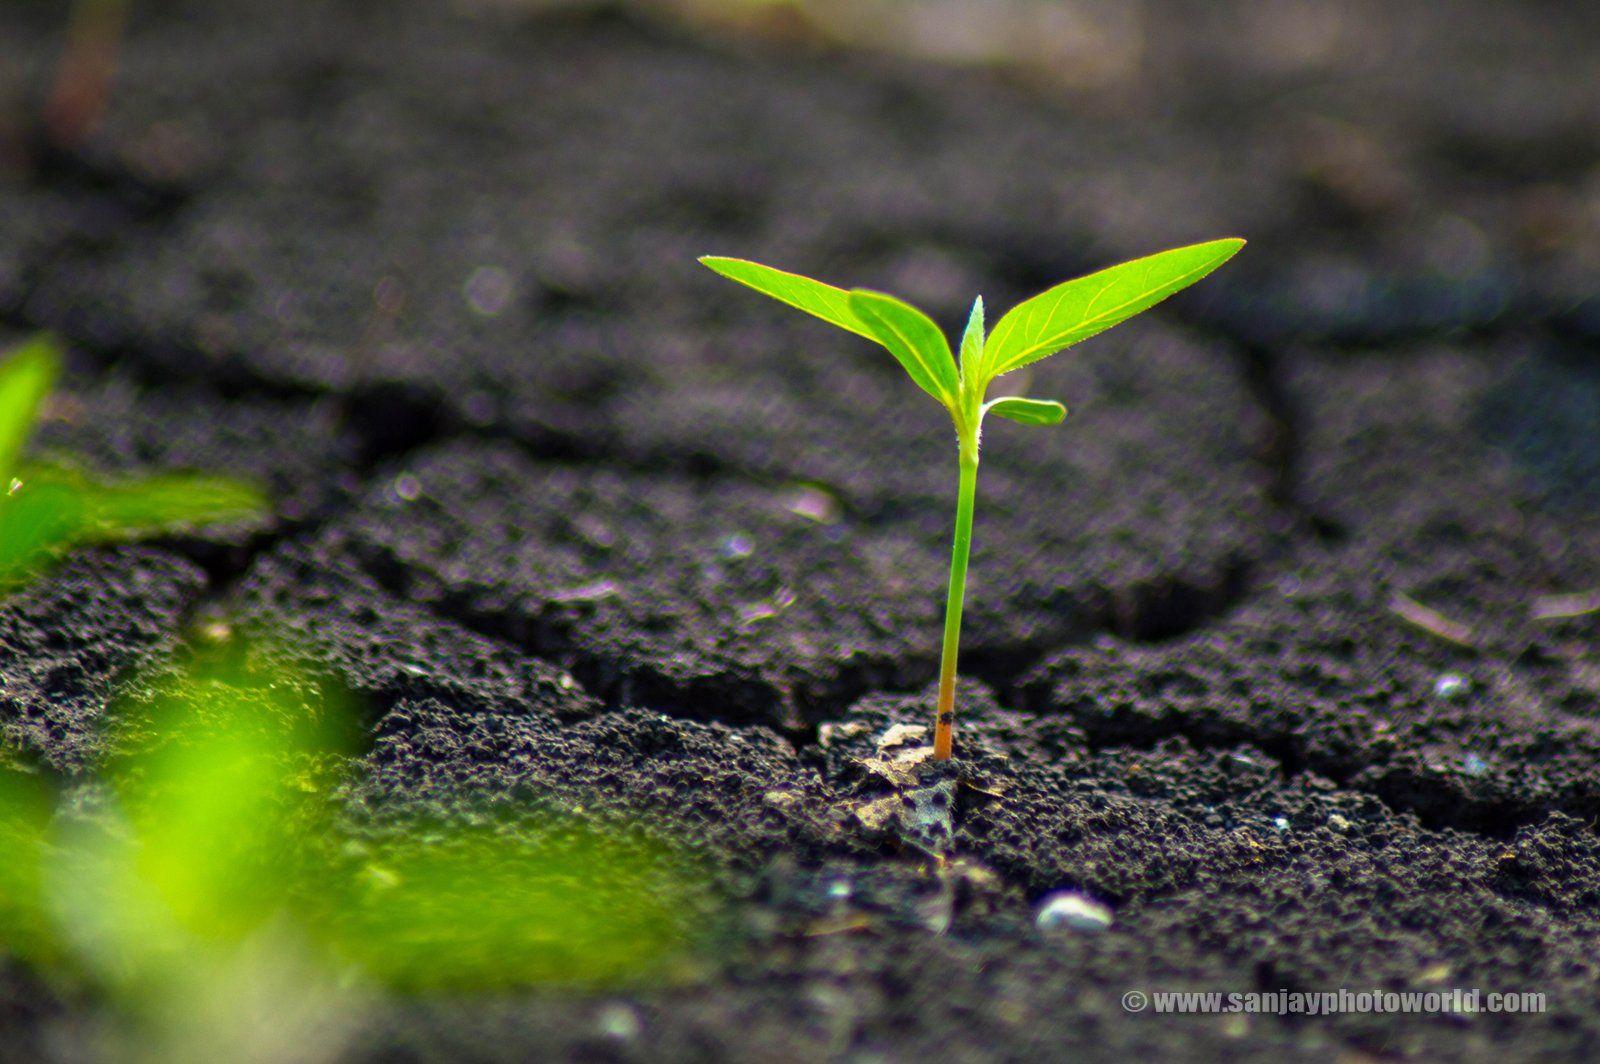 sedum plant hd wallpaper - photo #20